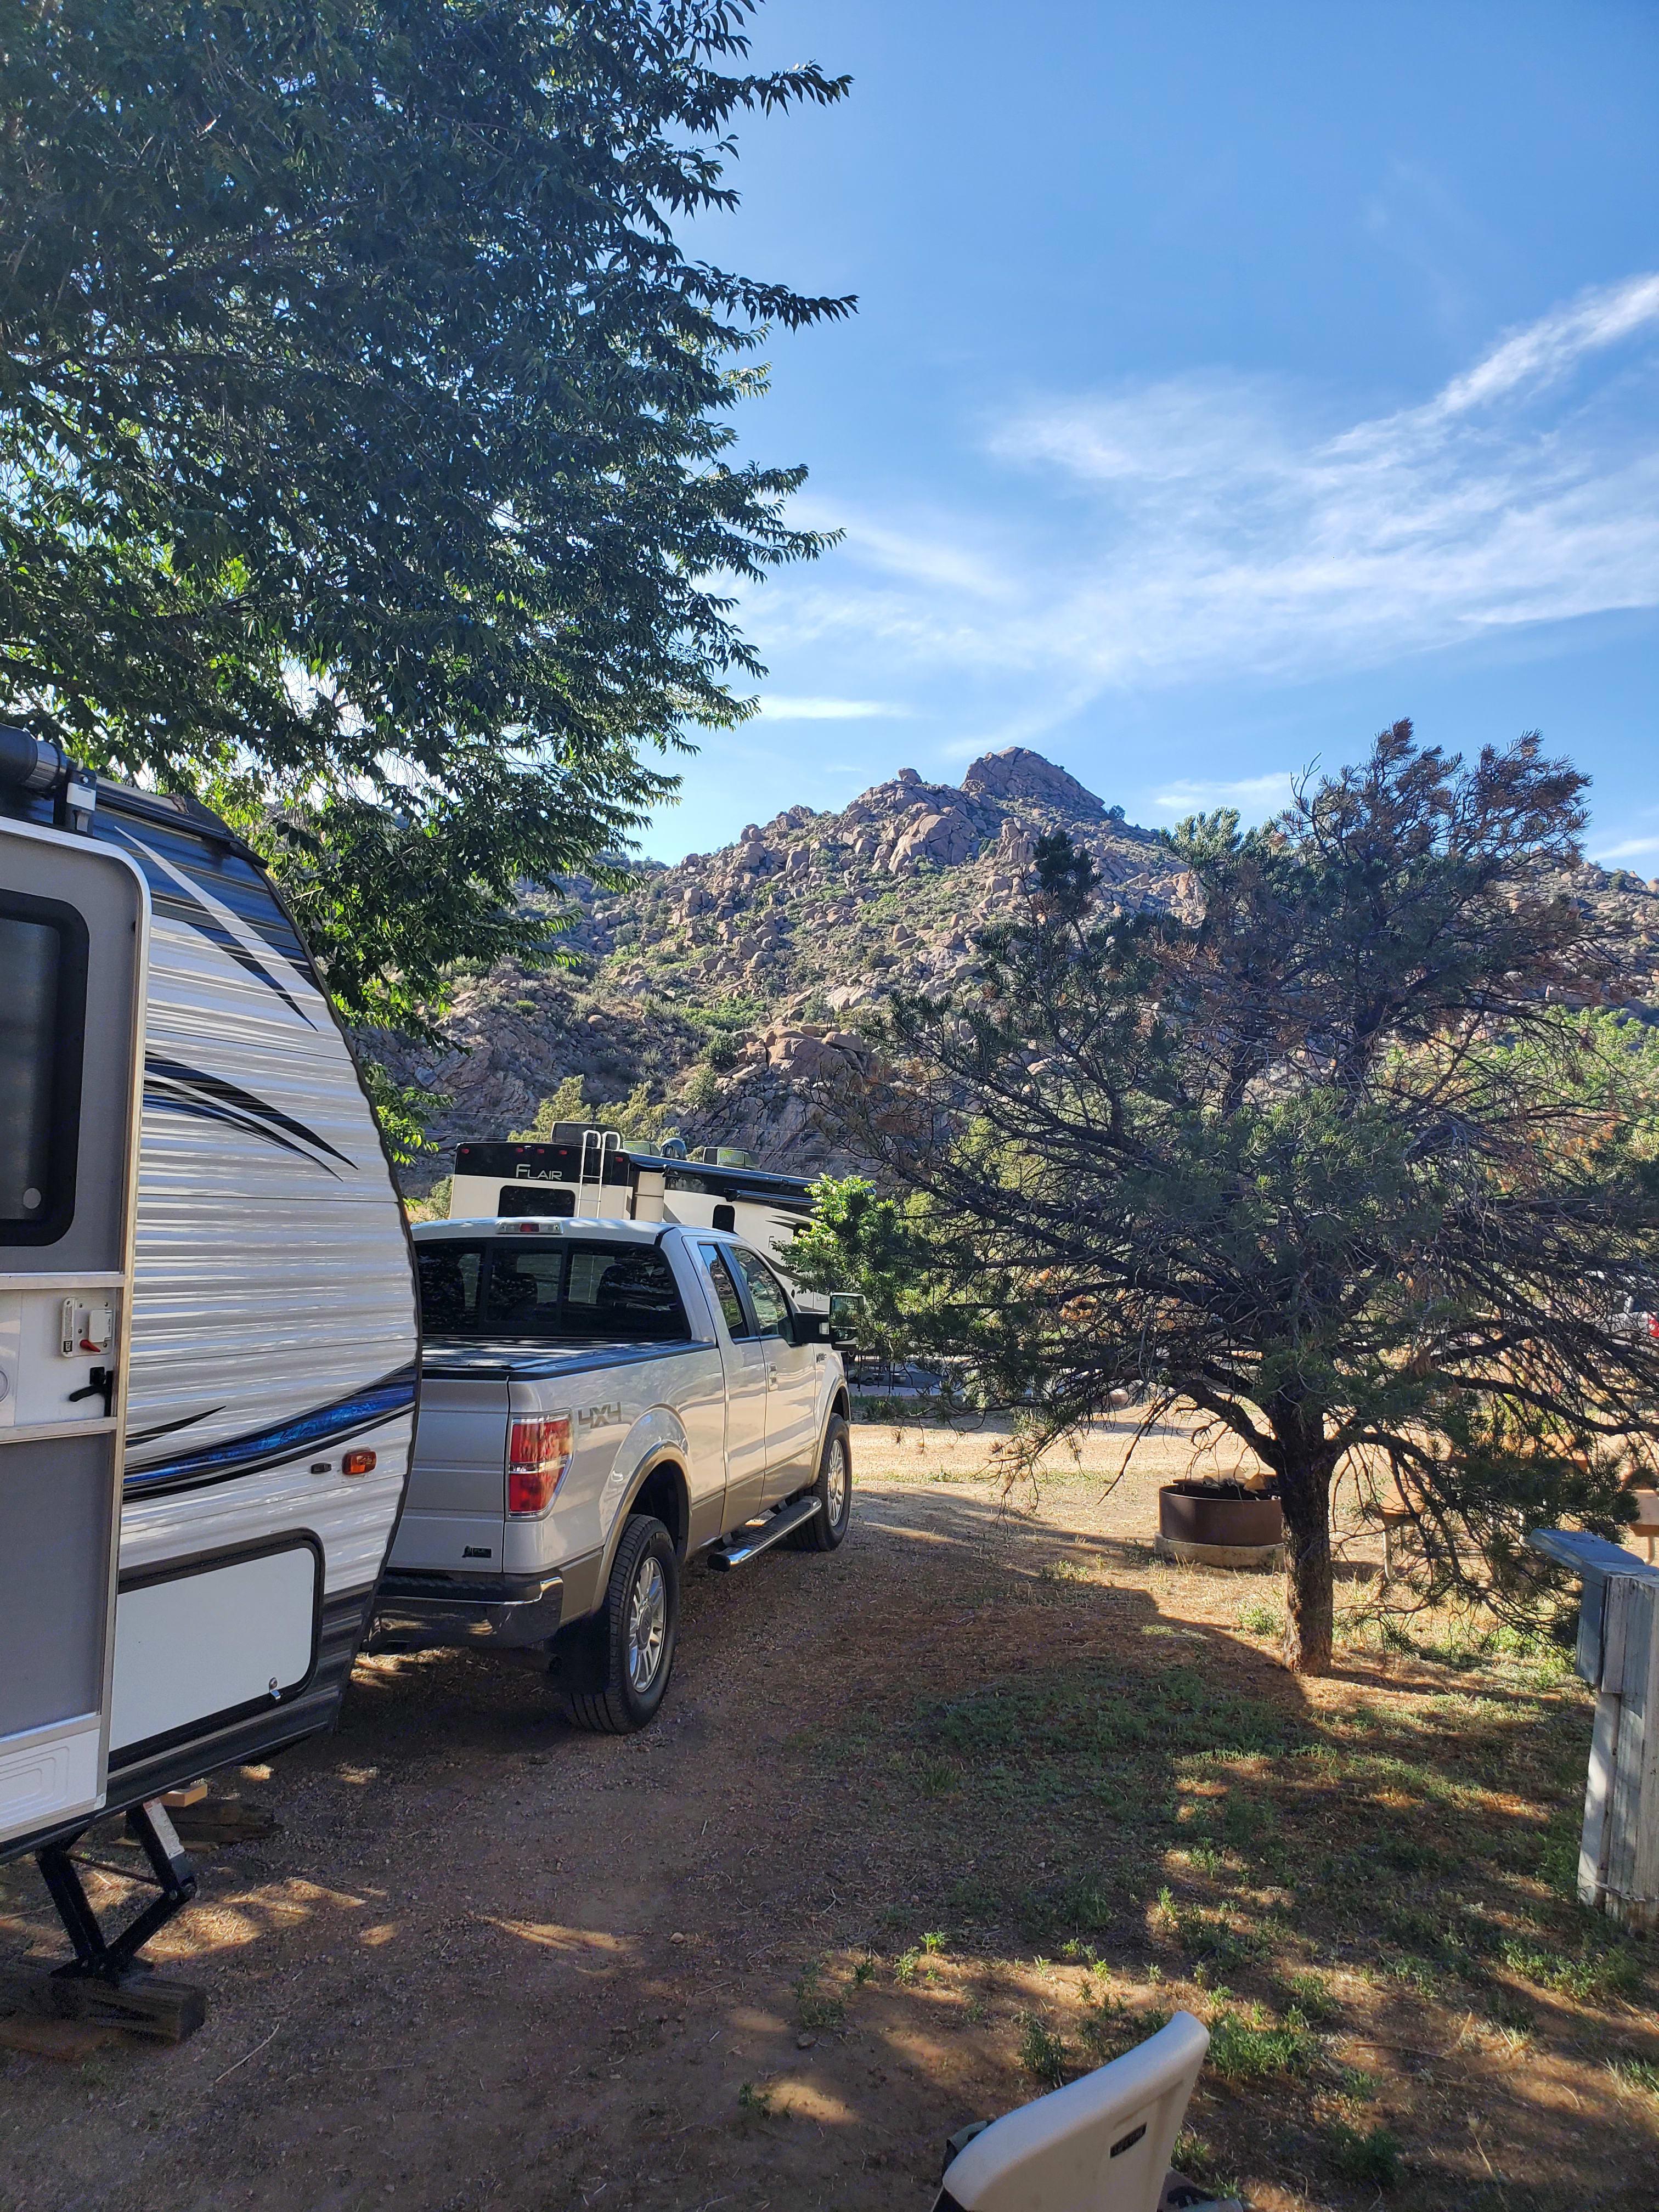 Our view from Cotapaxi KOA #9. Palomino Puma 2018